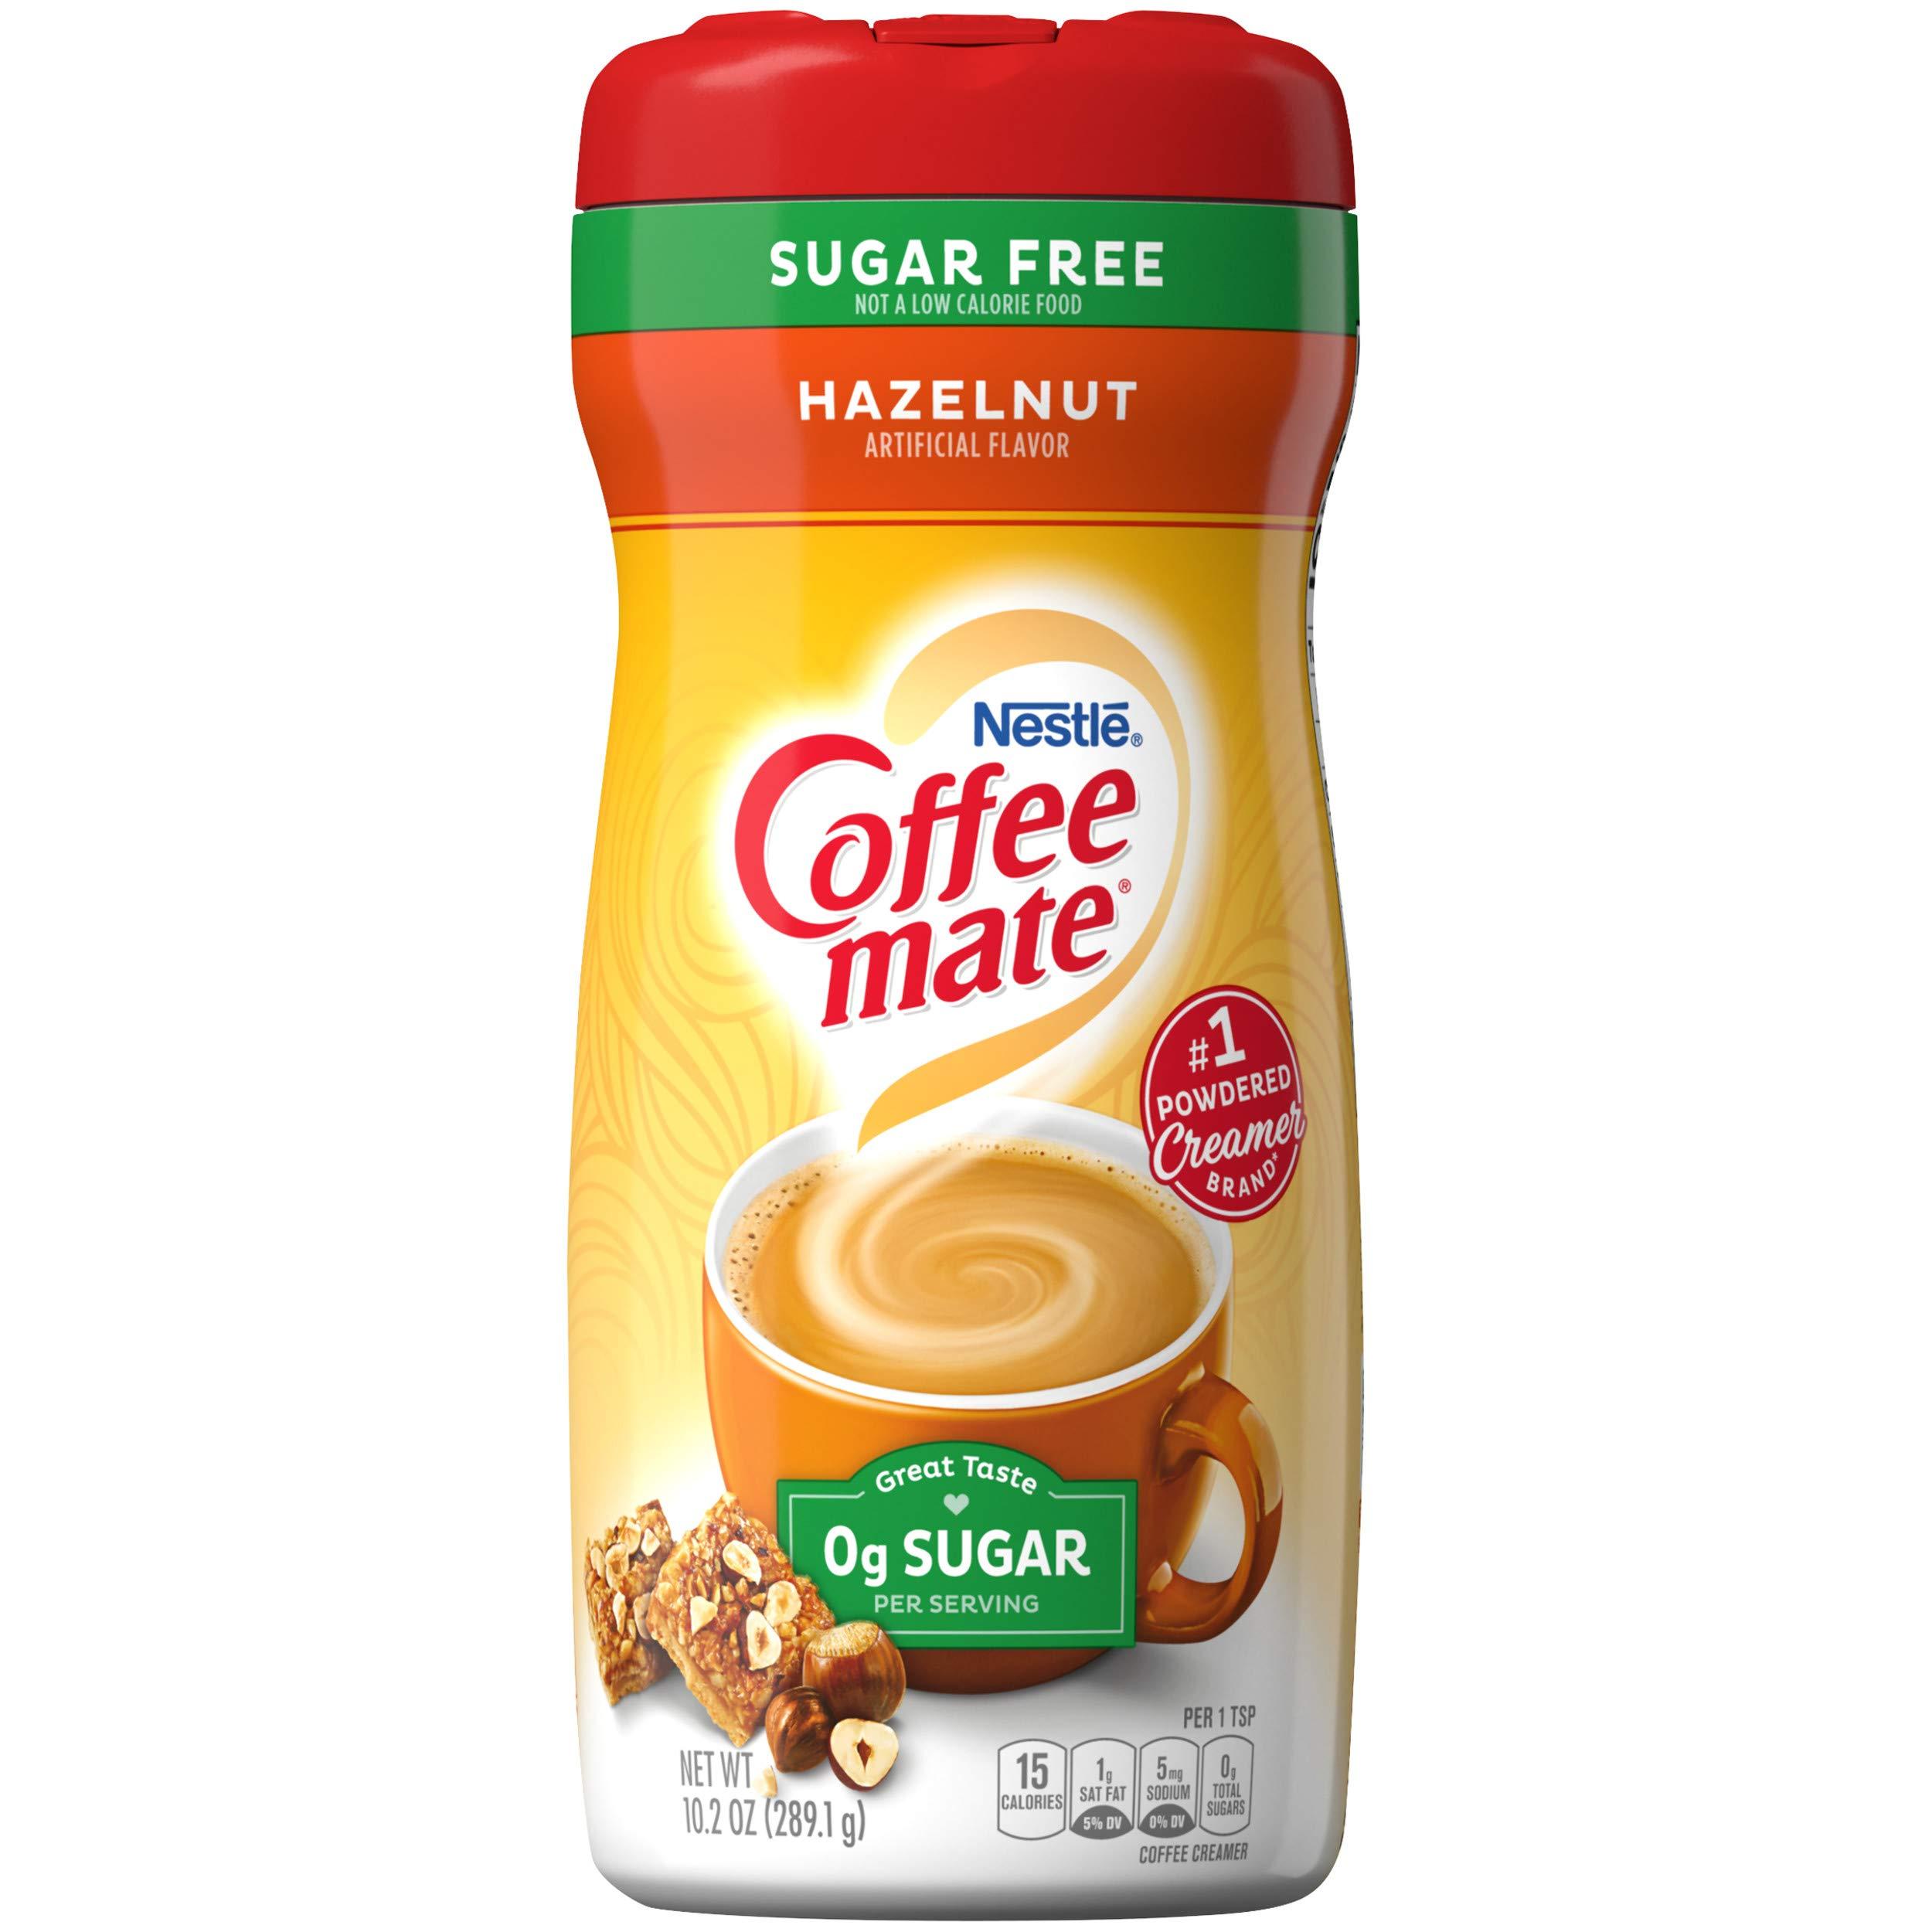 COFFEE MATE Sugar Free Hazelnut Powder Coffee Creamer 10.2 oz. Canister (Pack of 6)